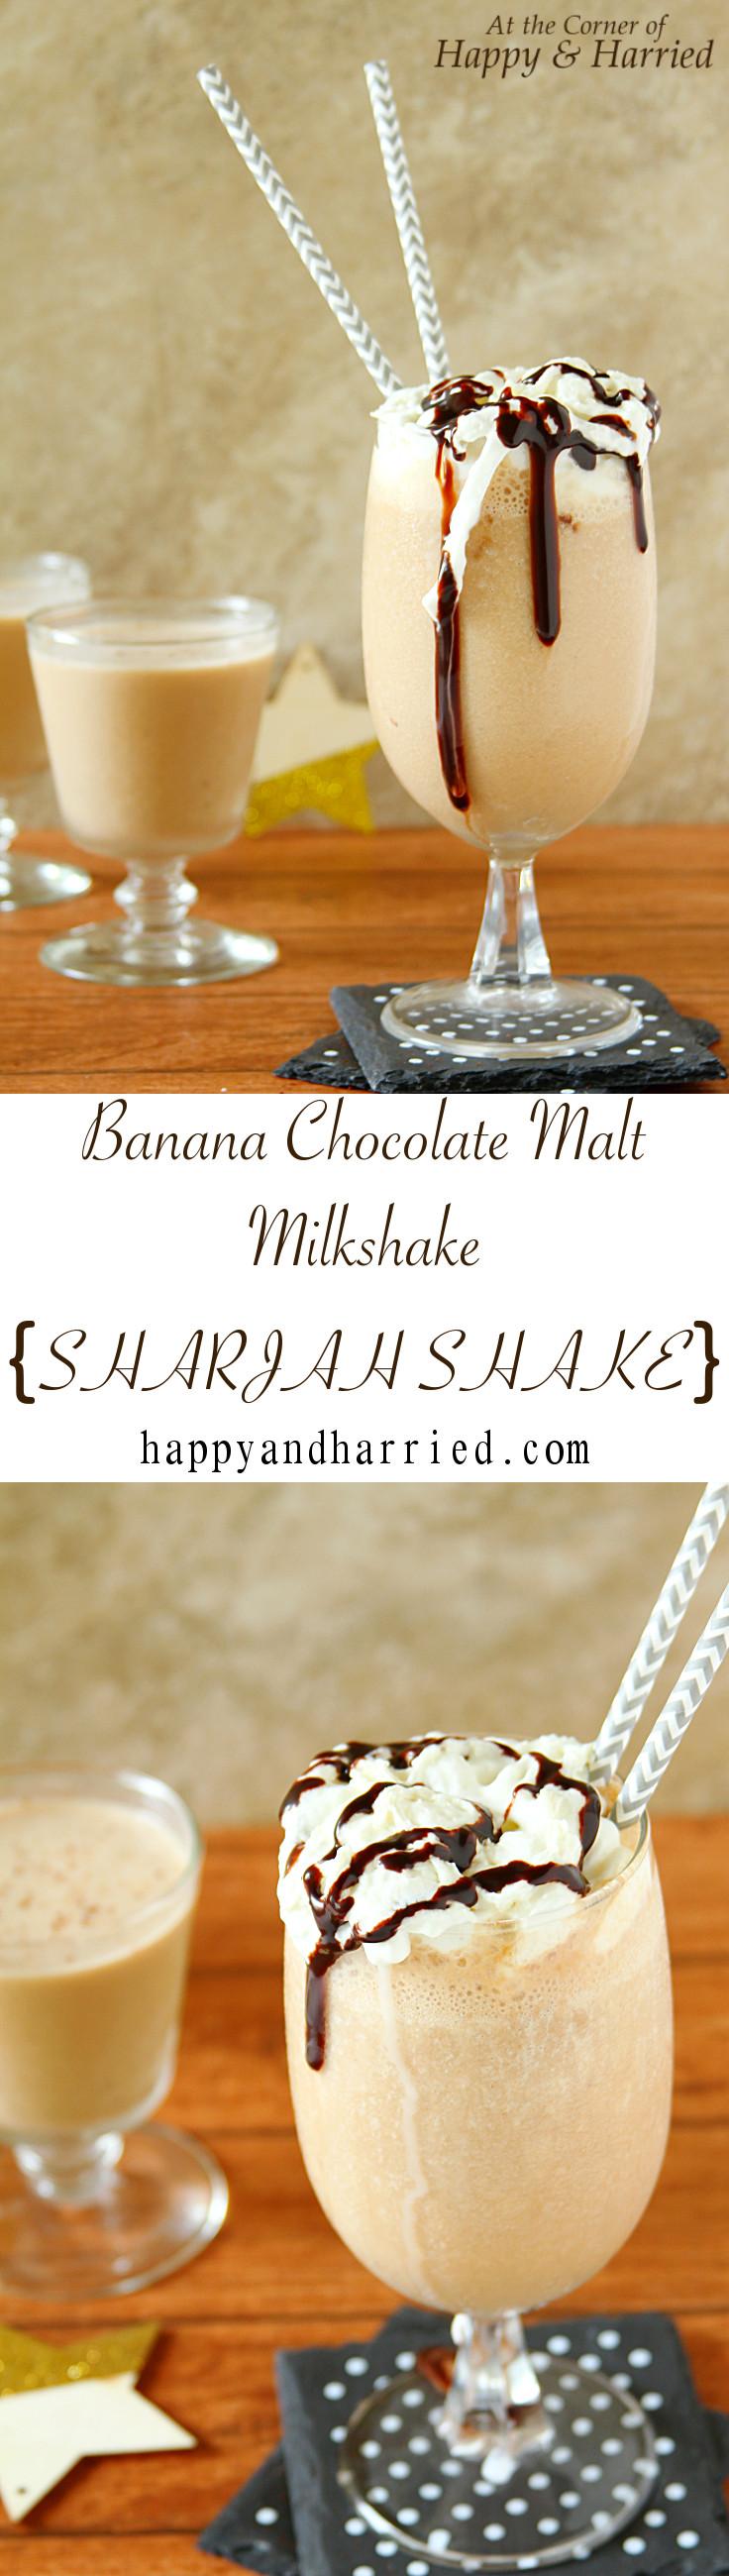 Banana Chocolate Malt Shake + Wolf Gourmet Blender Giveaway